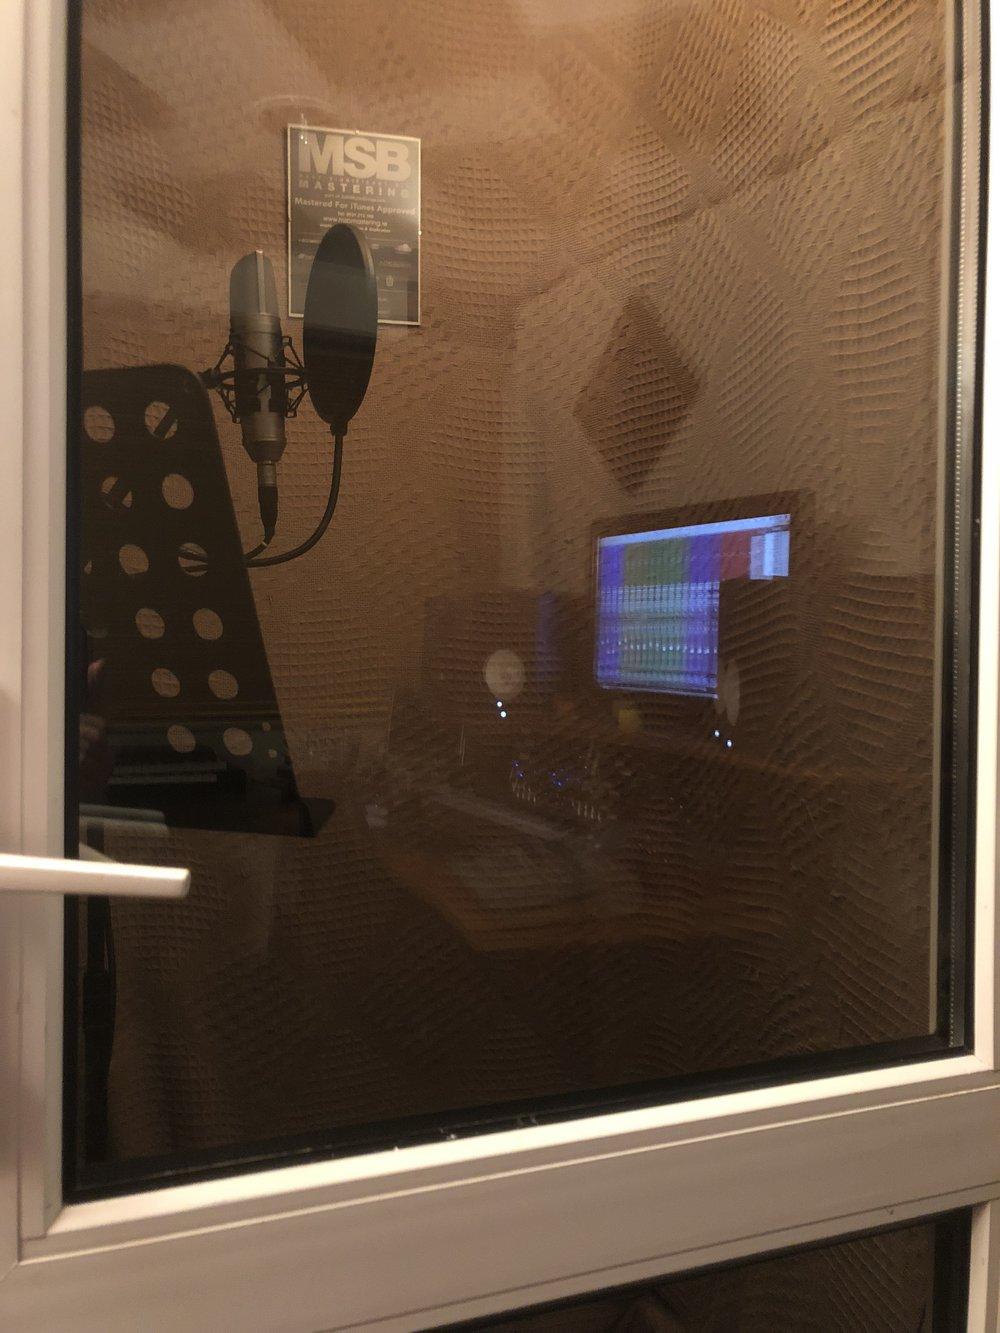 Studio 2 - Photography. Westand Studio Recording. Music